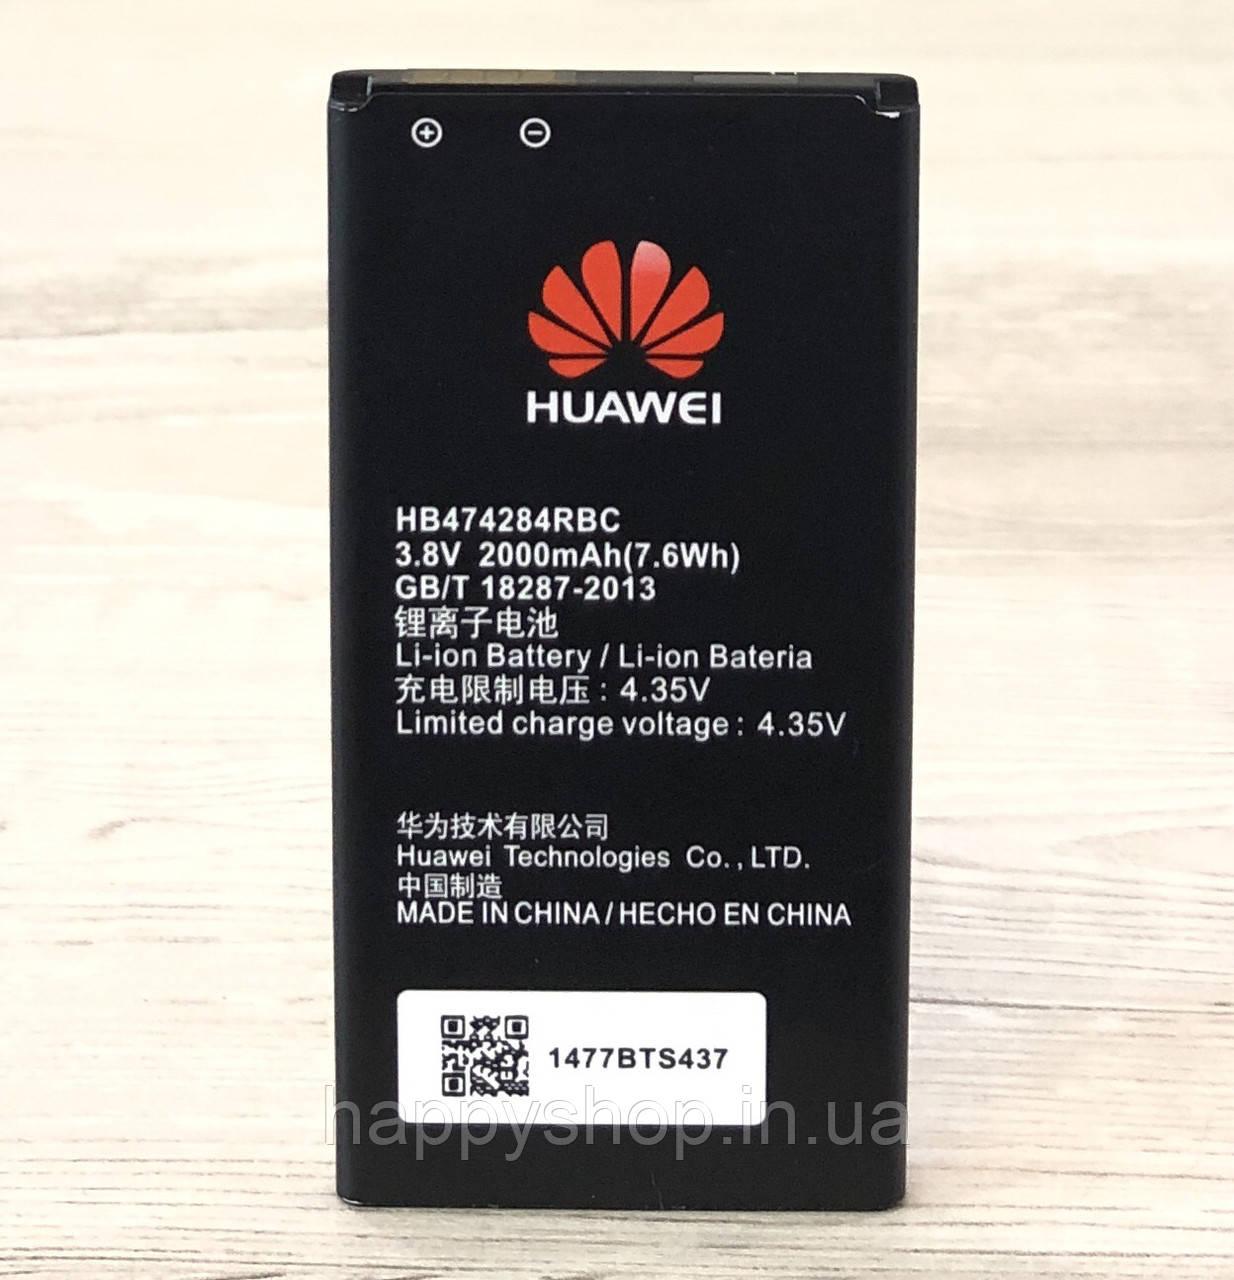 Оригінальна батарея Huawei Y625-U32 (HB474284RBC)